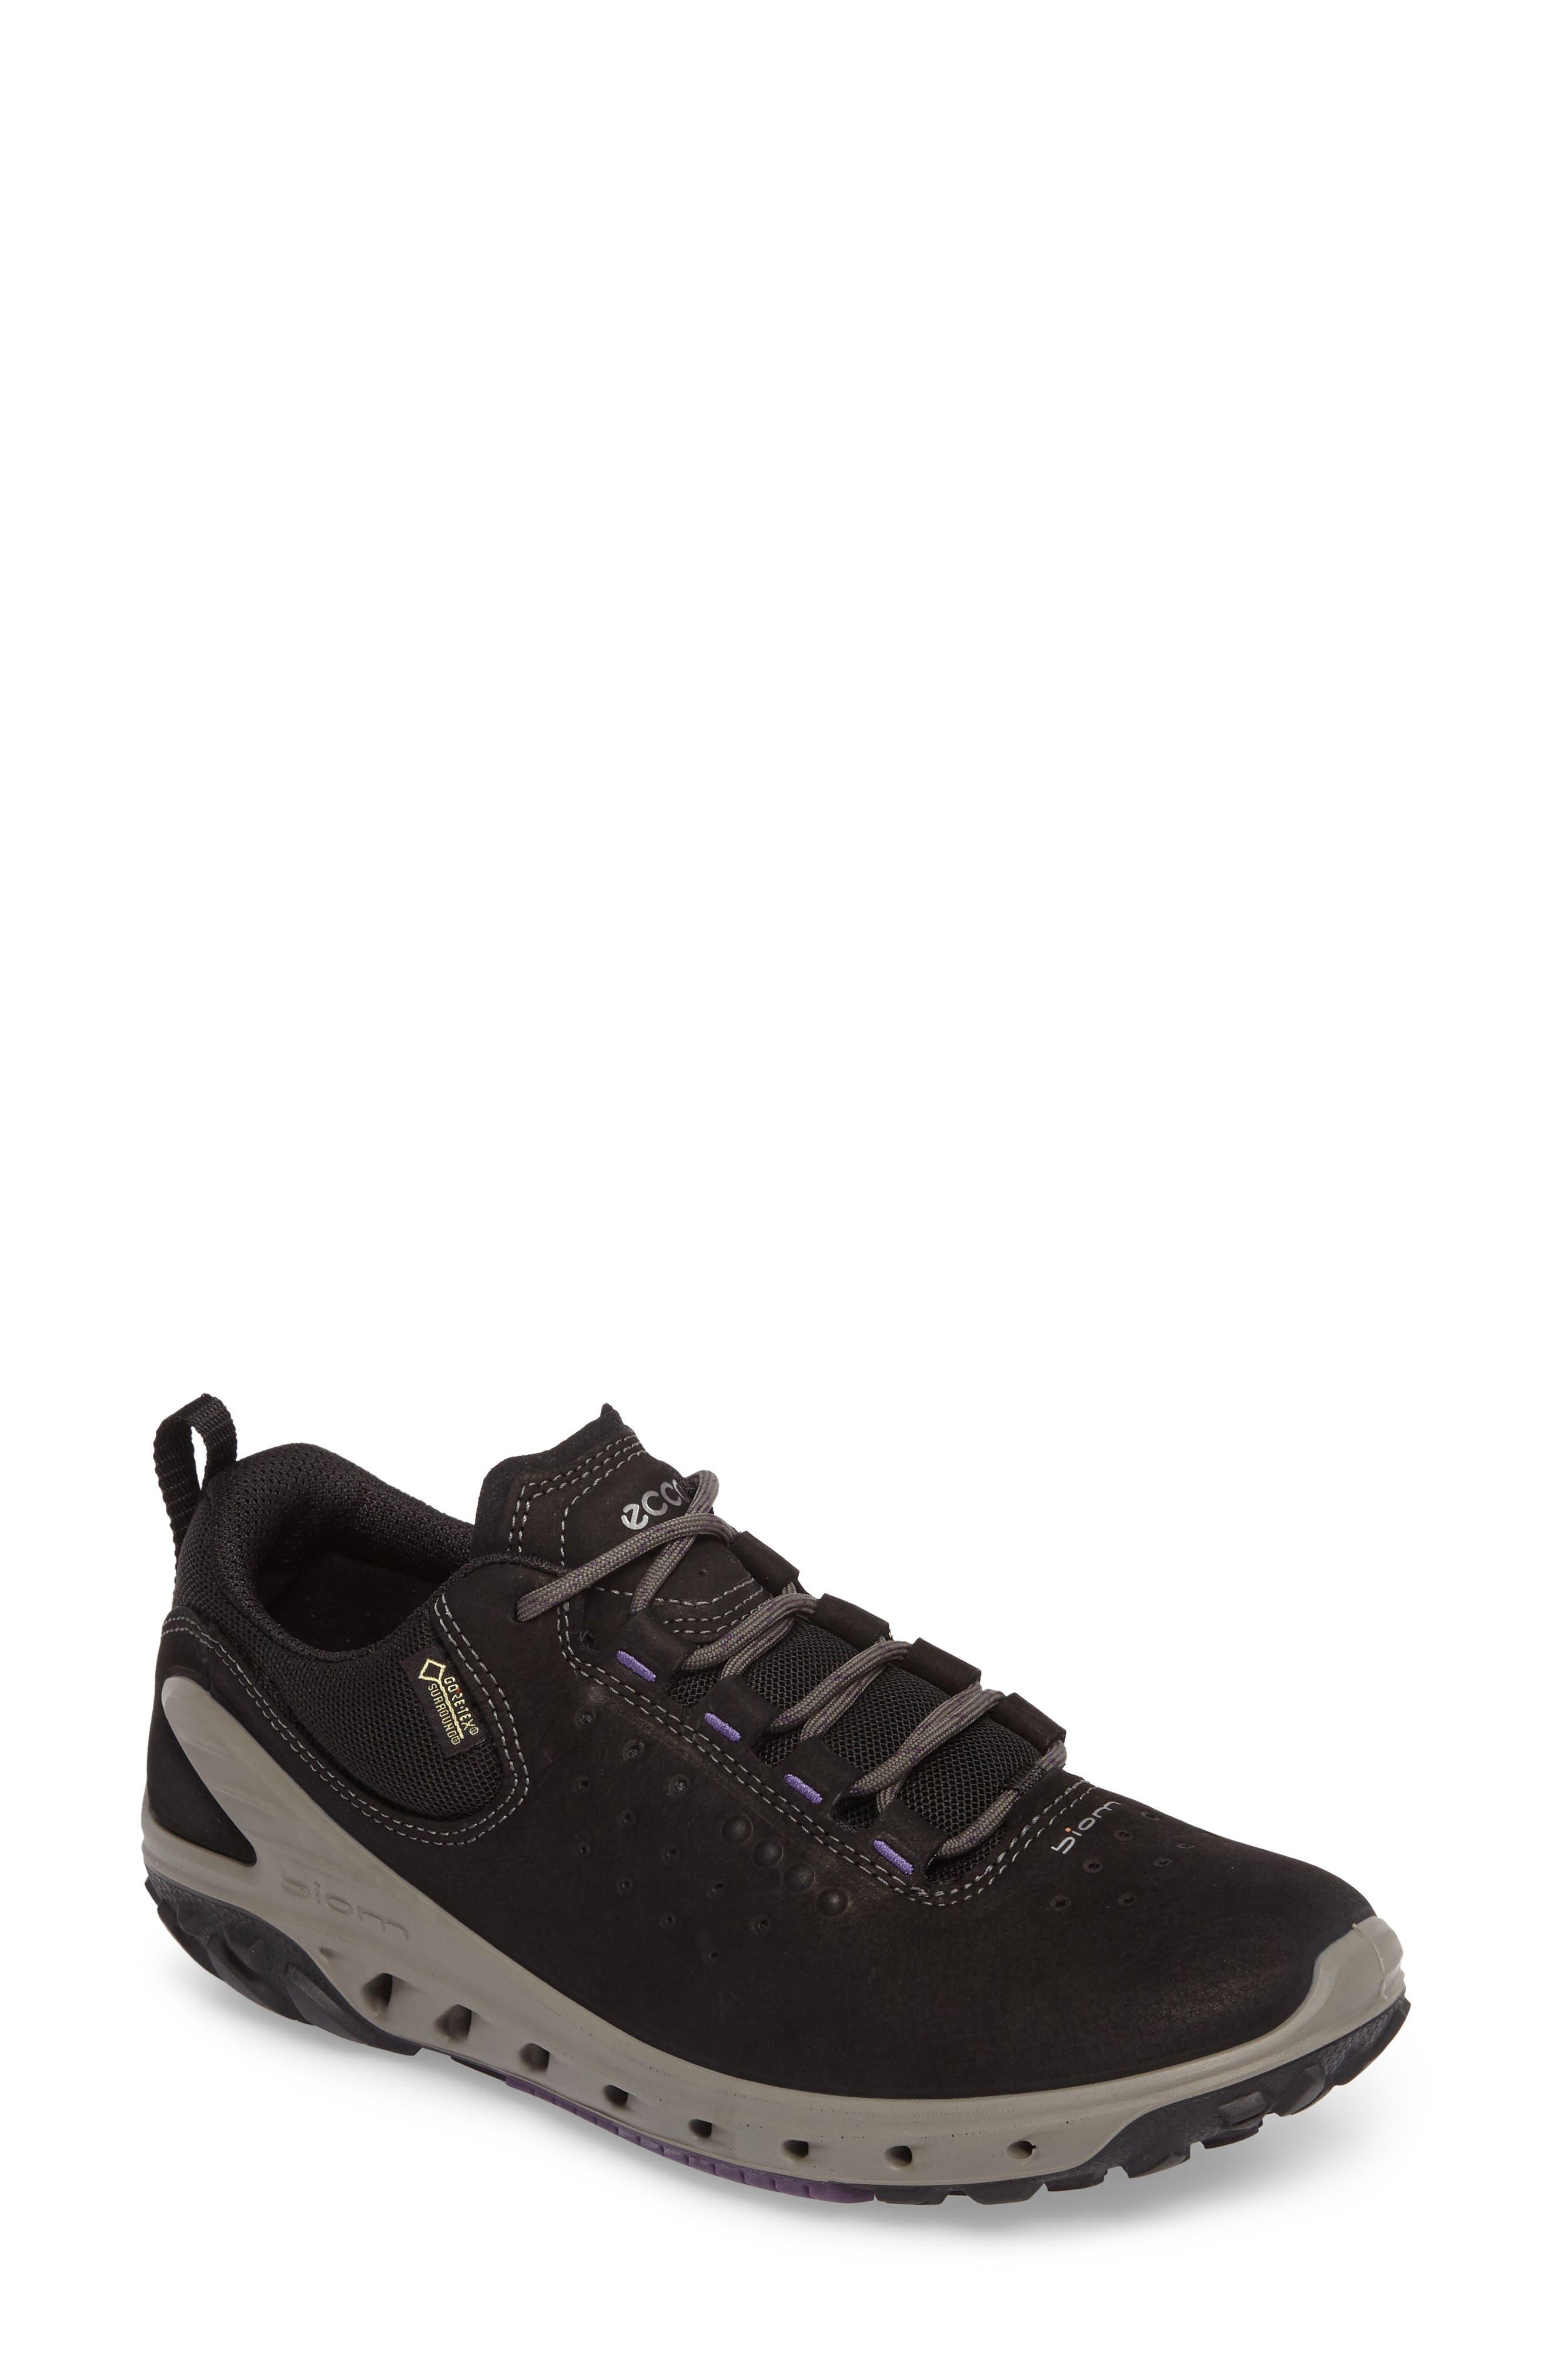 BIOM Venture GTX Sneaker,                             Main thumbnail 1, color,                             BLACK LEATHER